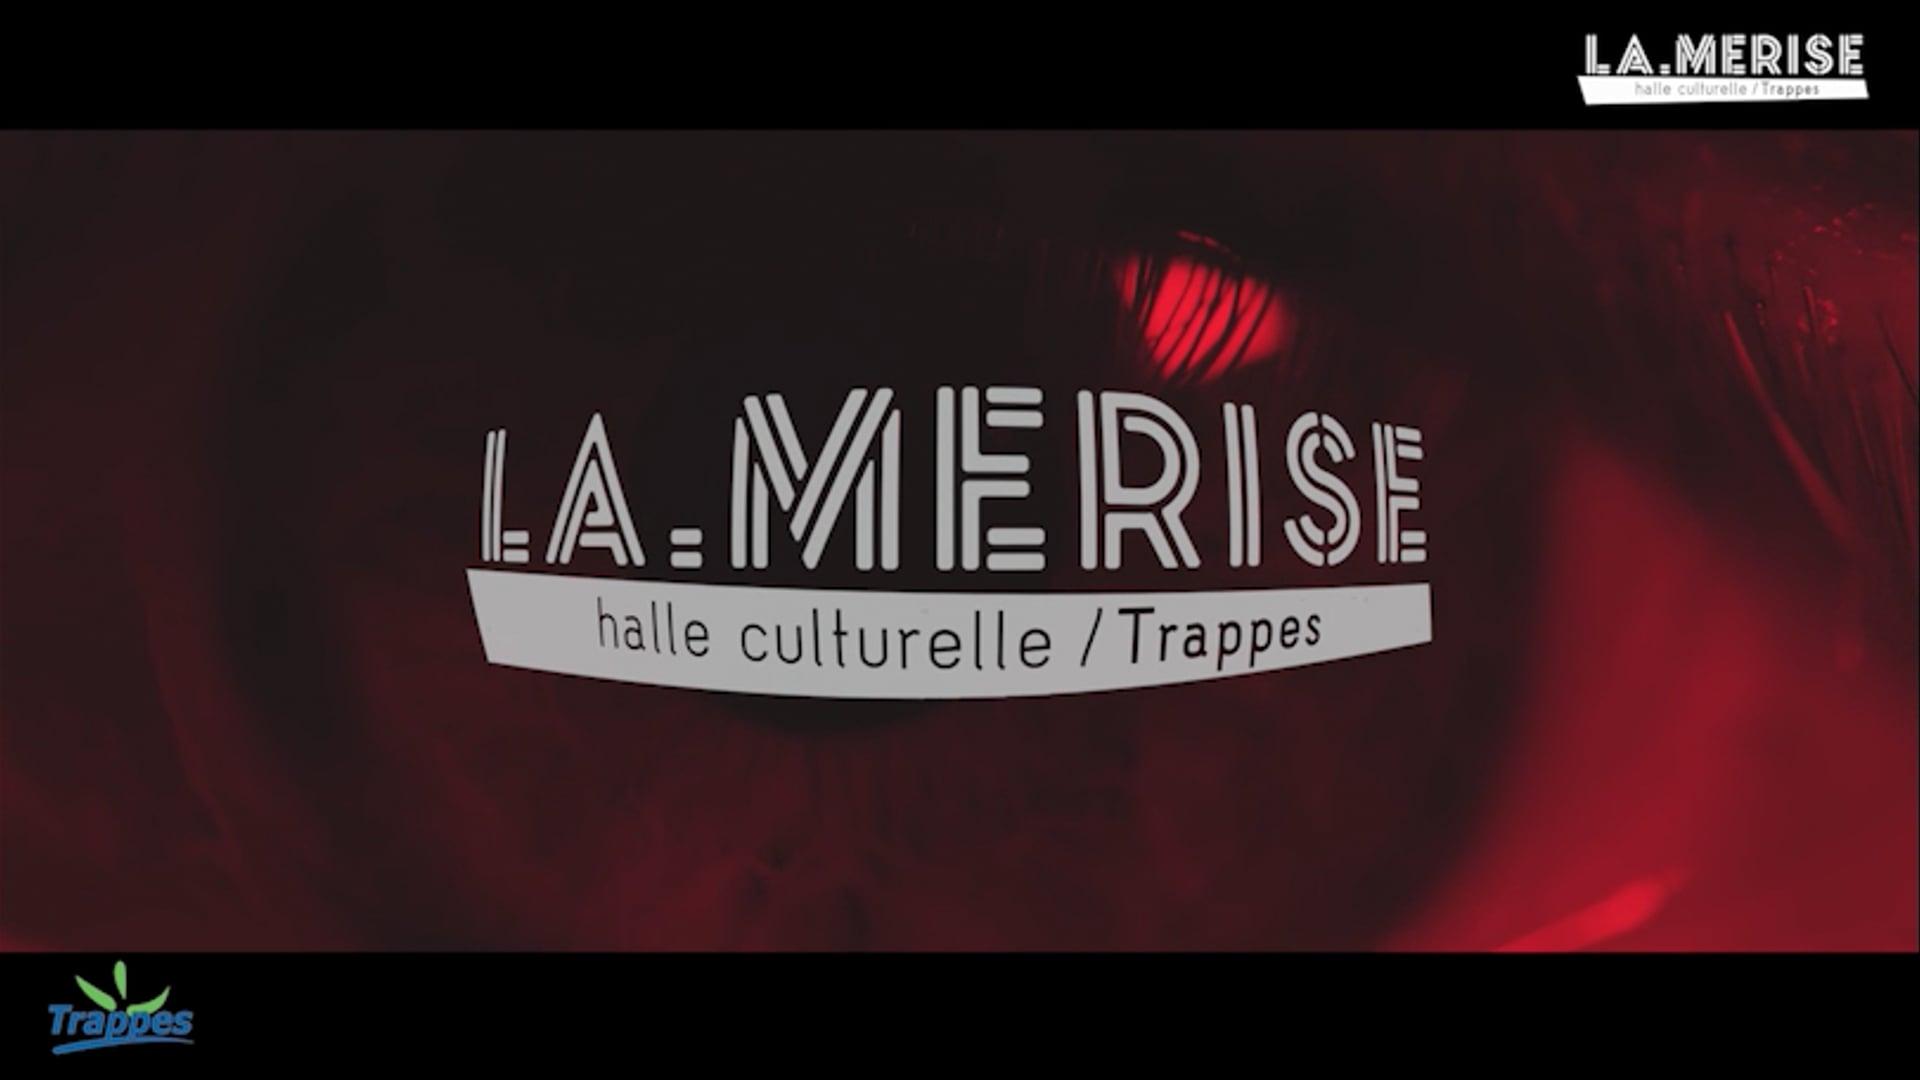 La Merise - Teaser Facebook Saison 2021-2022   Trappes